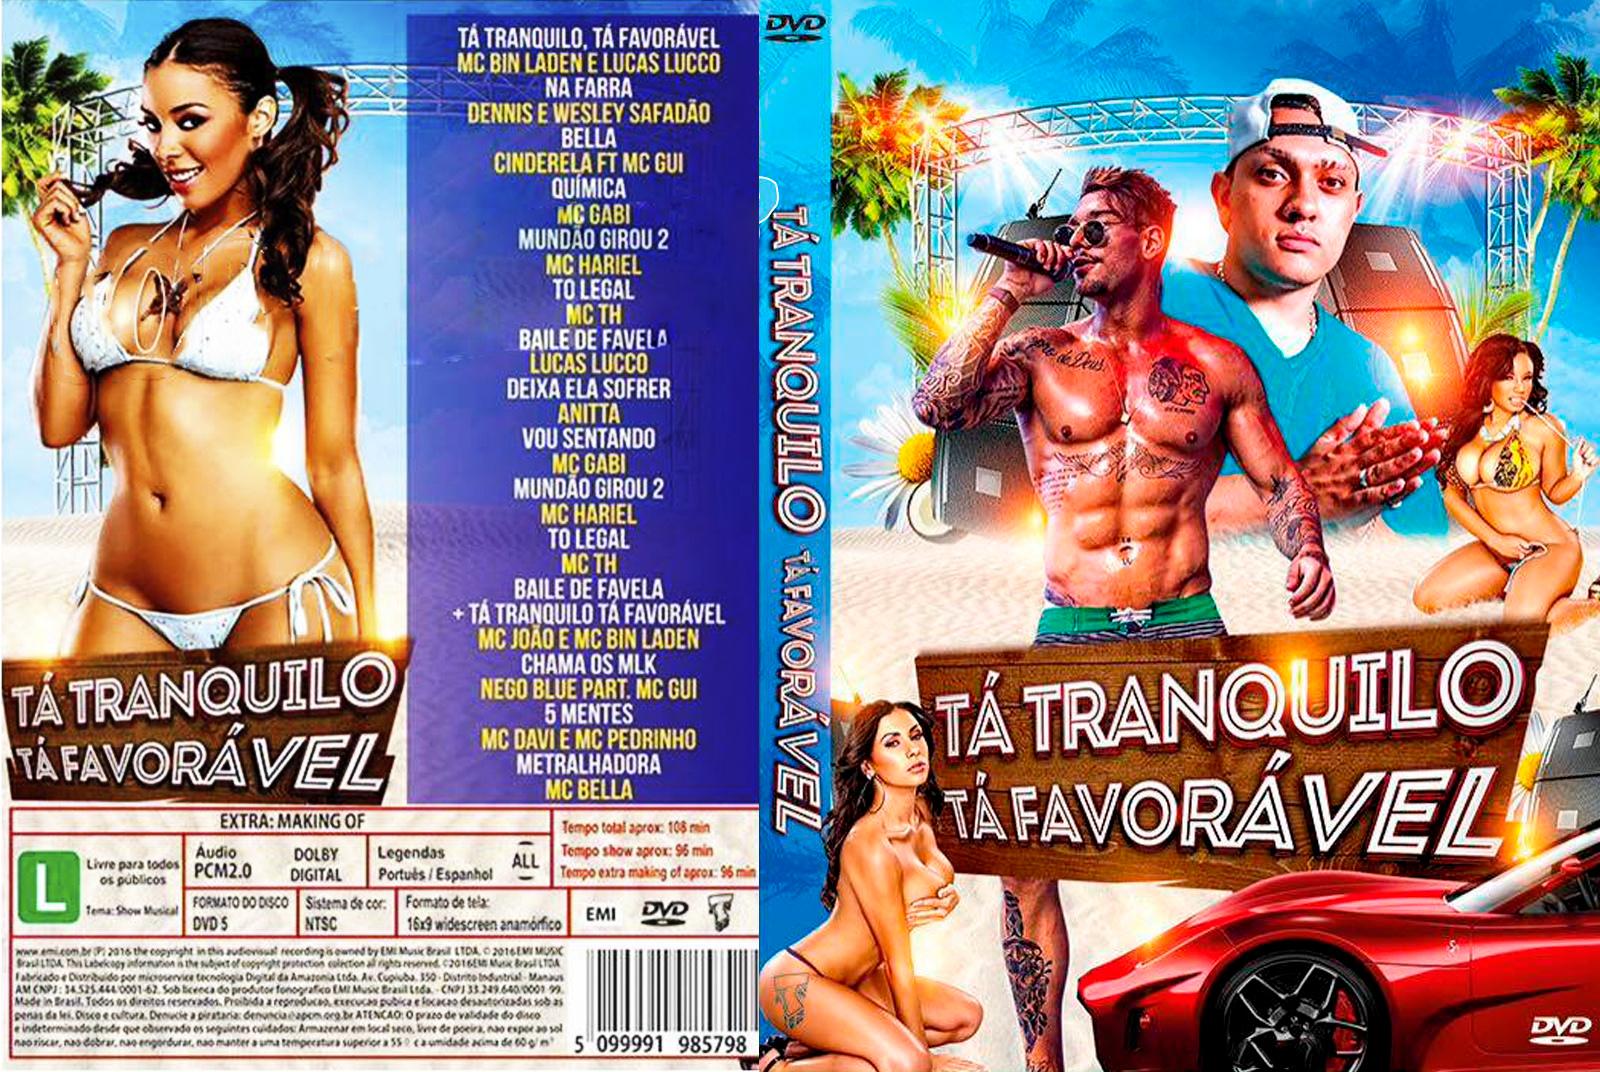 Ta Tranquilo Ta Favoravel DVD-R Ta 2BTranquilo 2BTa 2BFavoravel 2BDVD R 2BXANDAODOWNLOAD